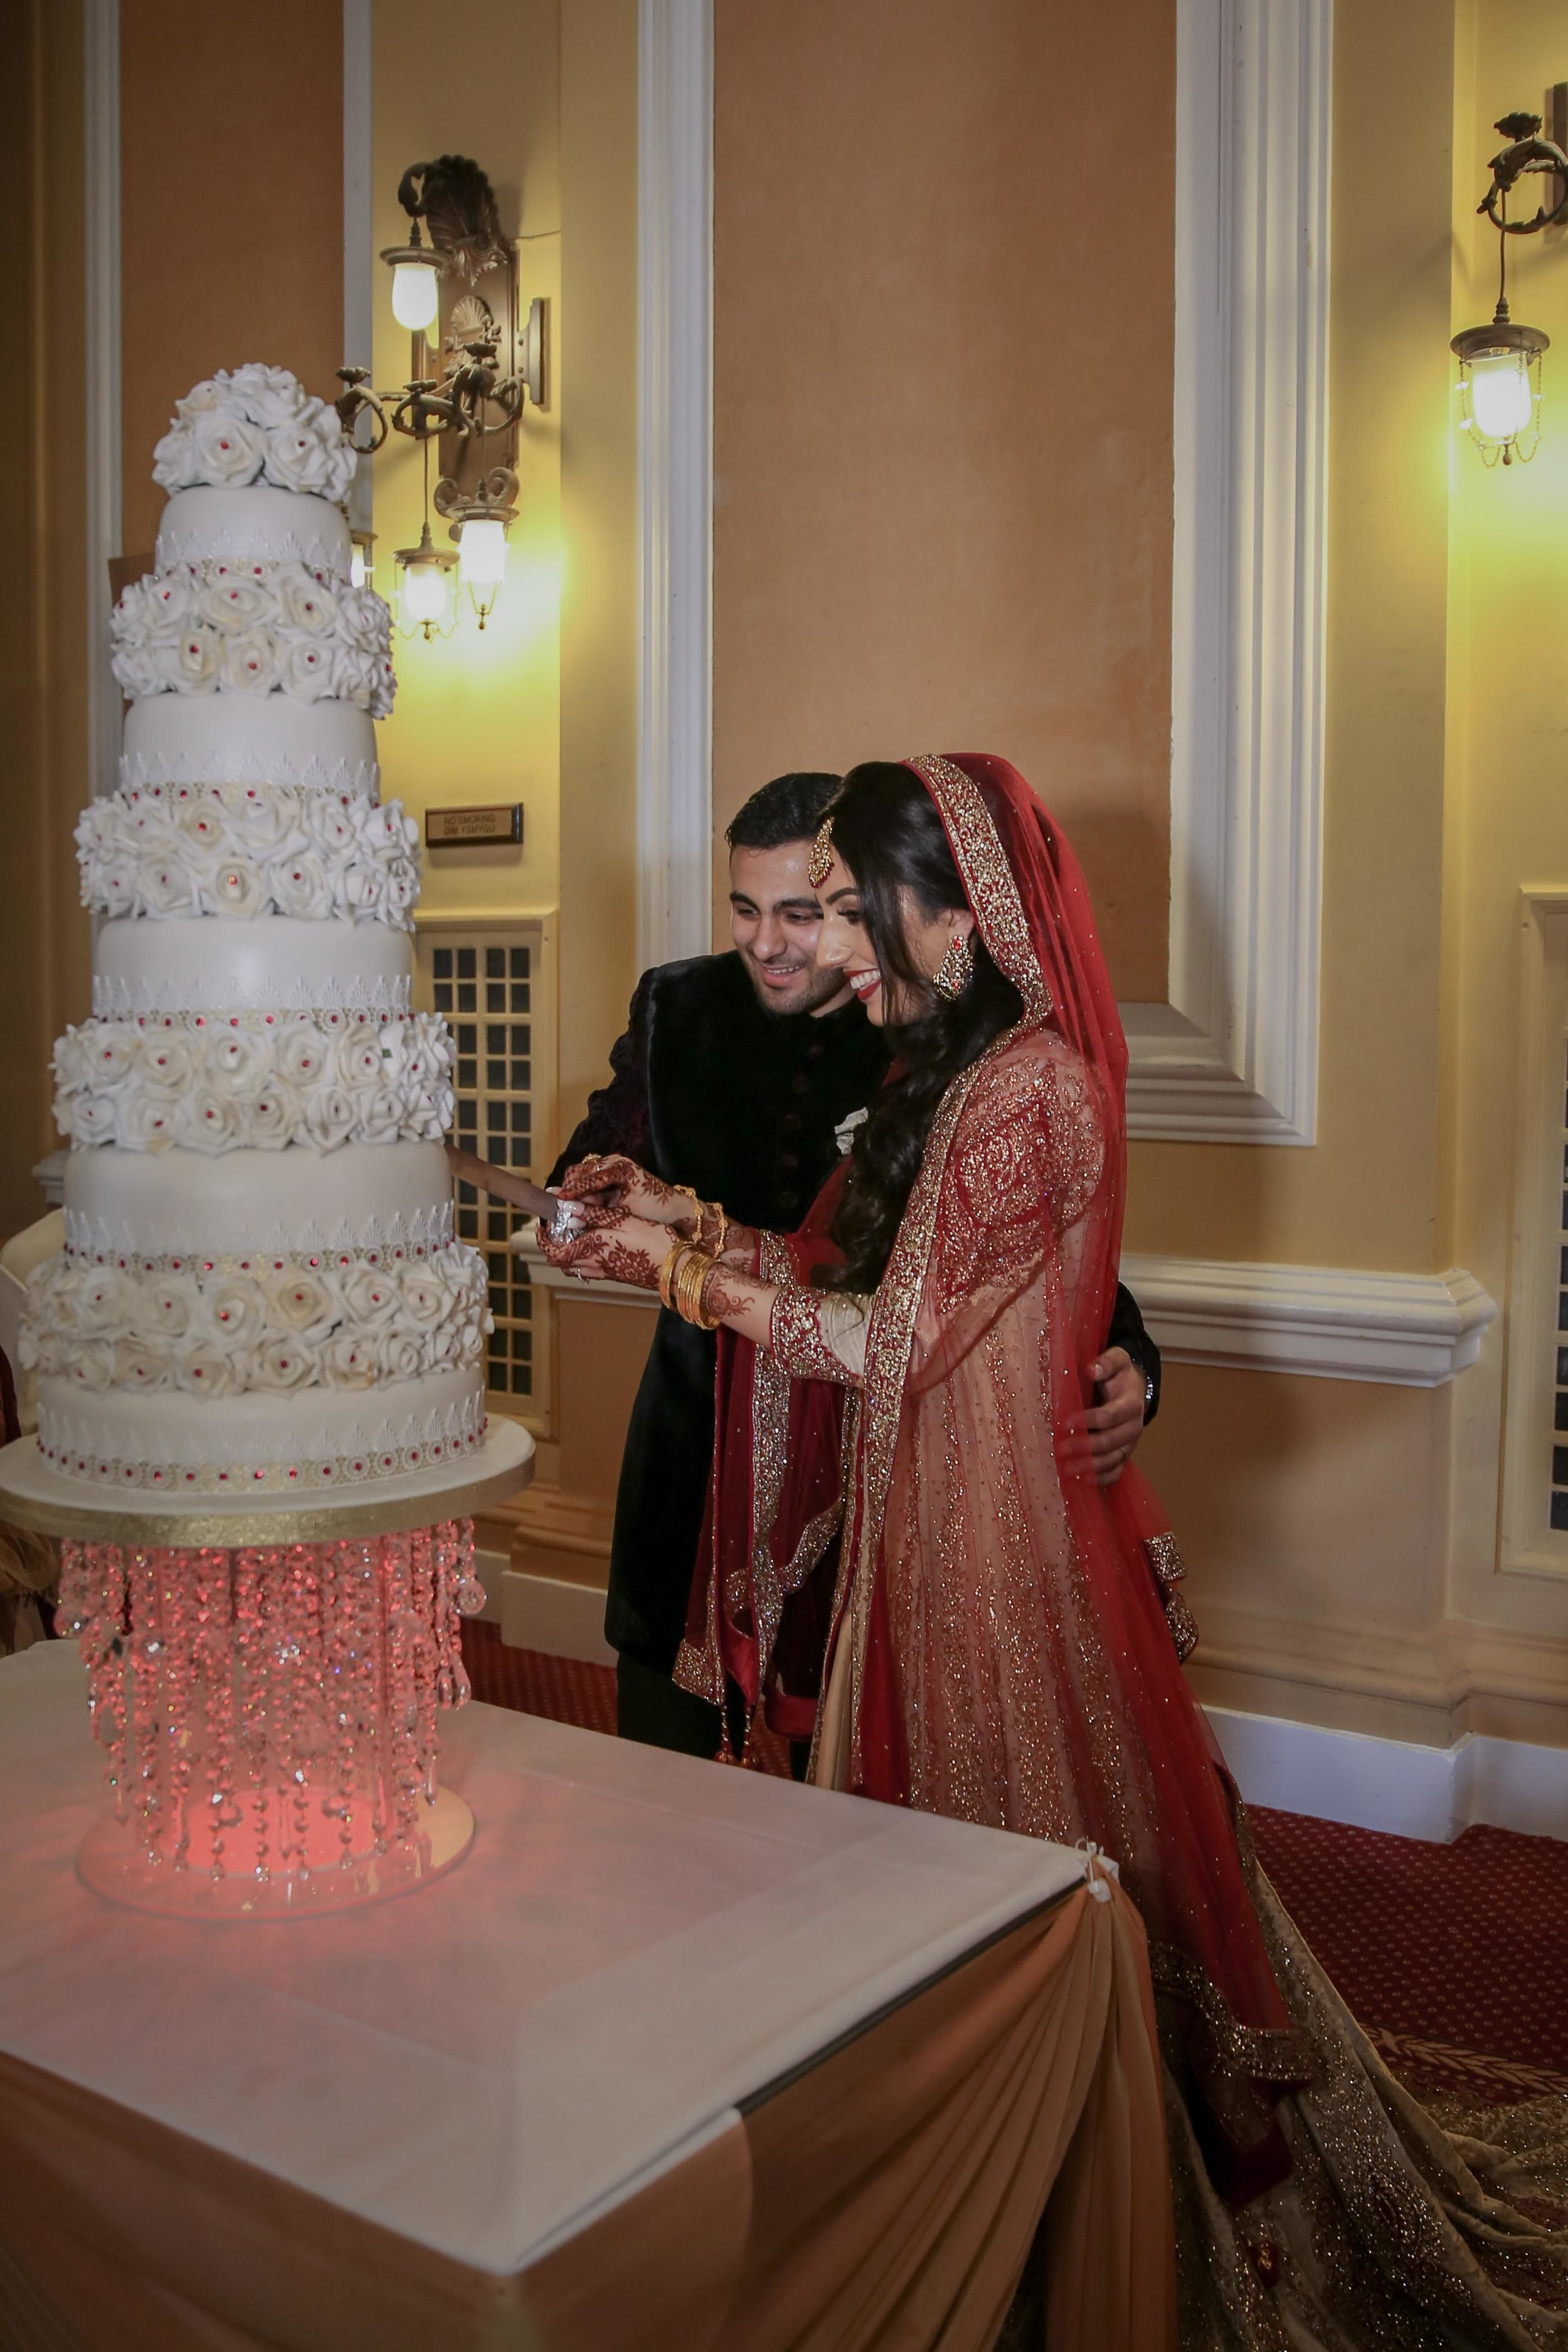 Female-asian-wedding-photographer-Cardiff-City-Hall-natalia-smith-photography-42.jpg